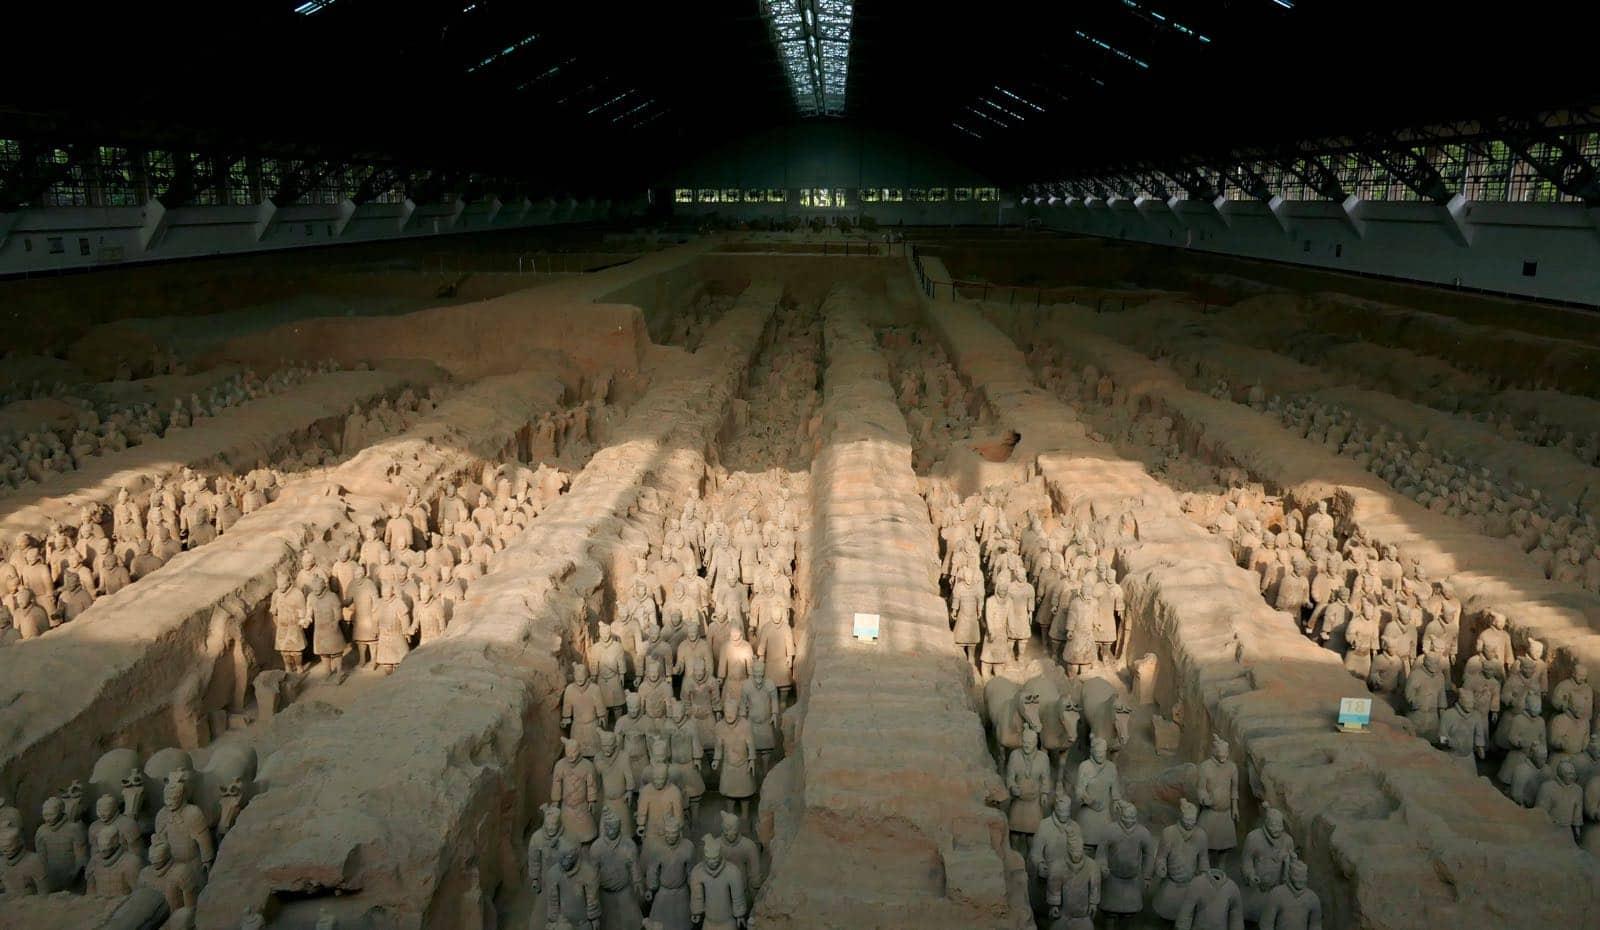 Terracotta Army Xi'an China betternotstop